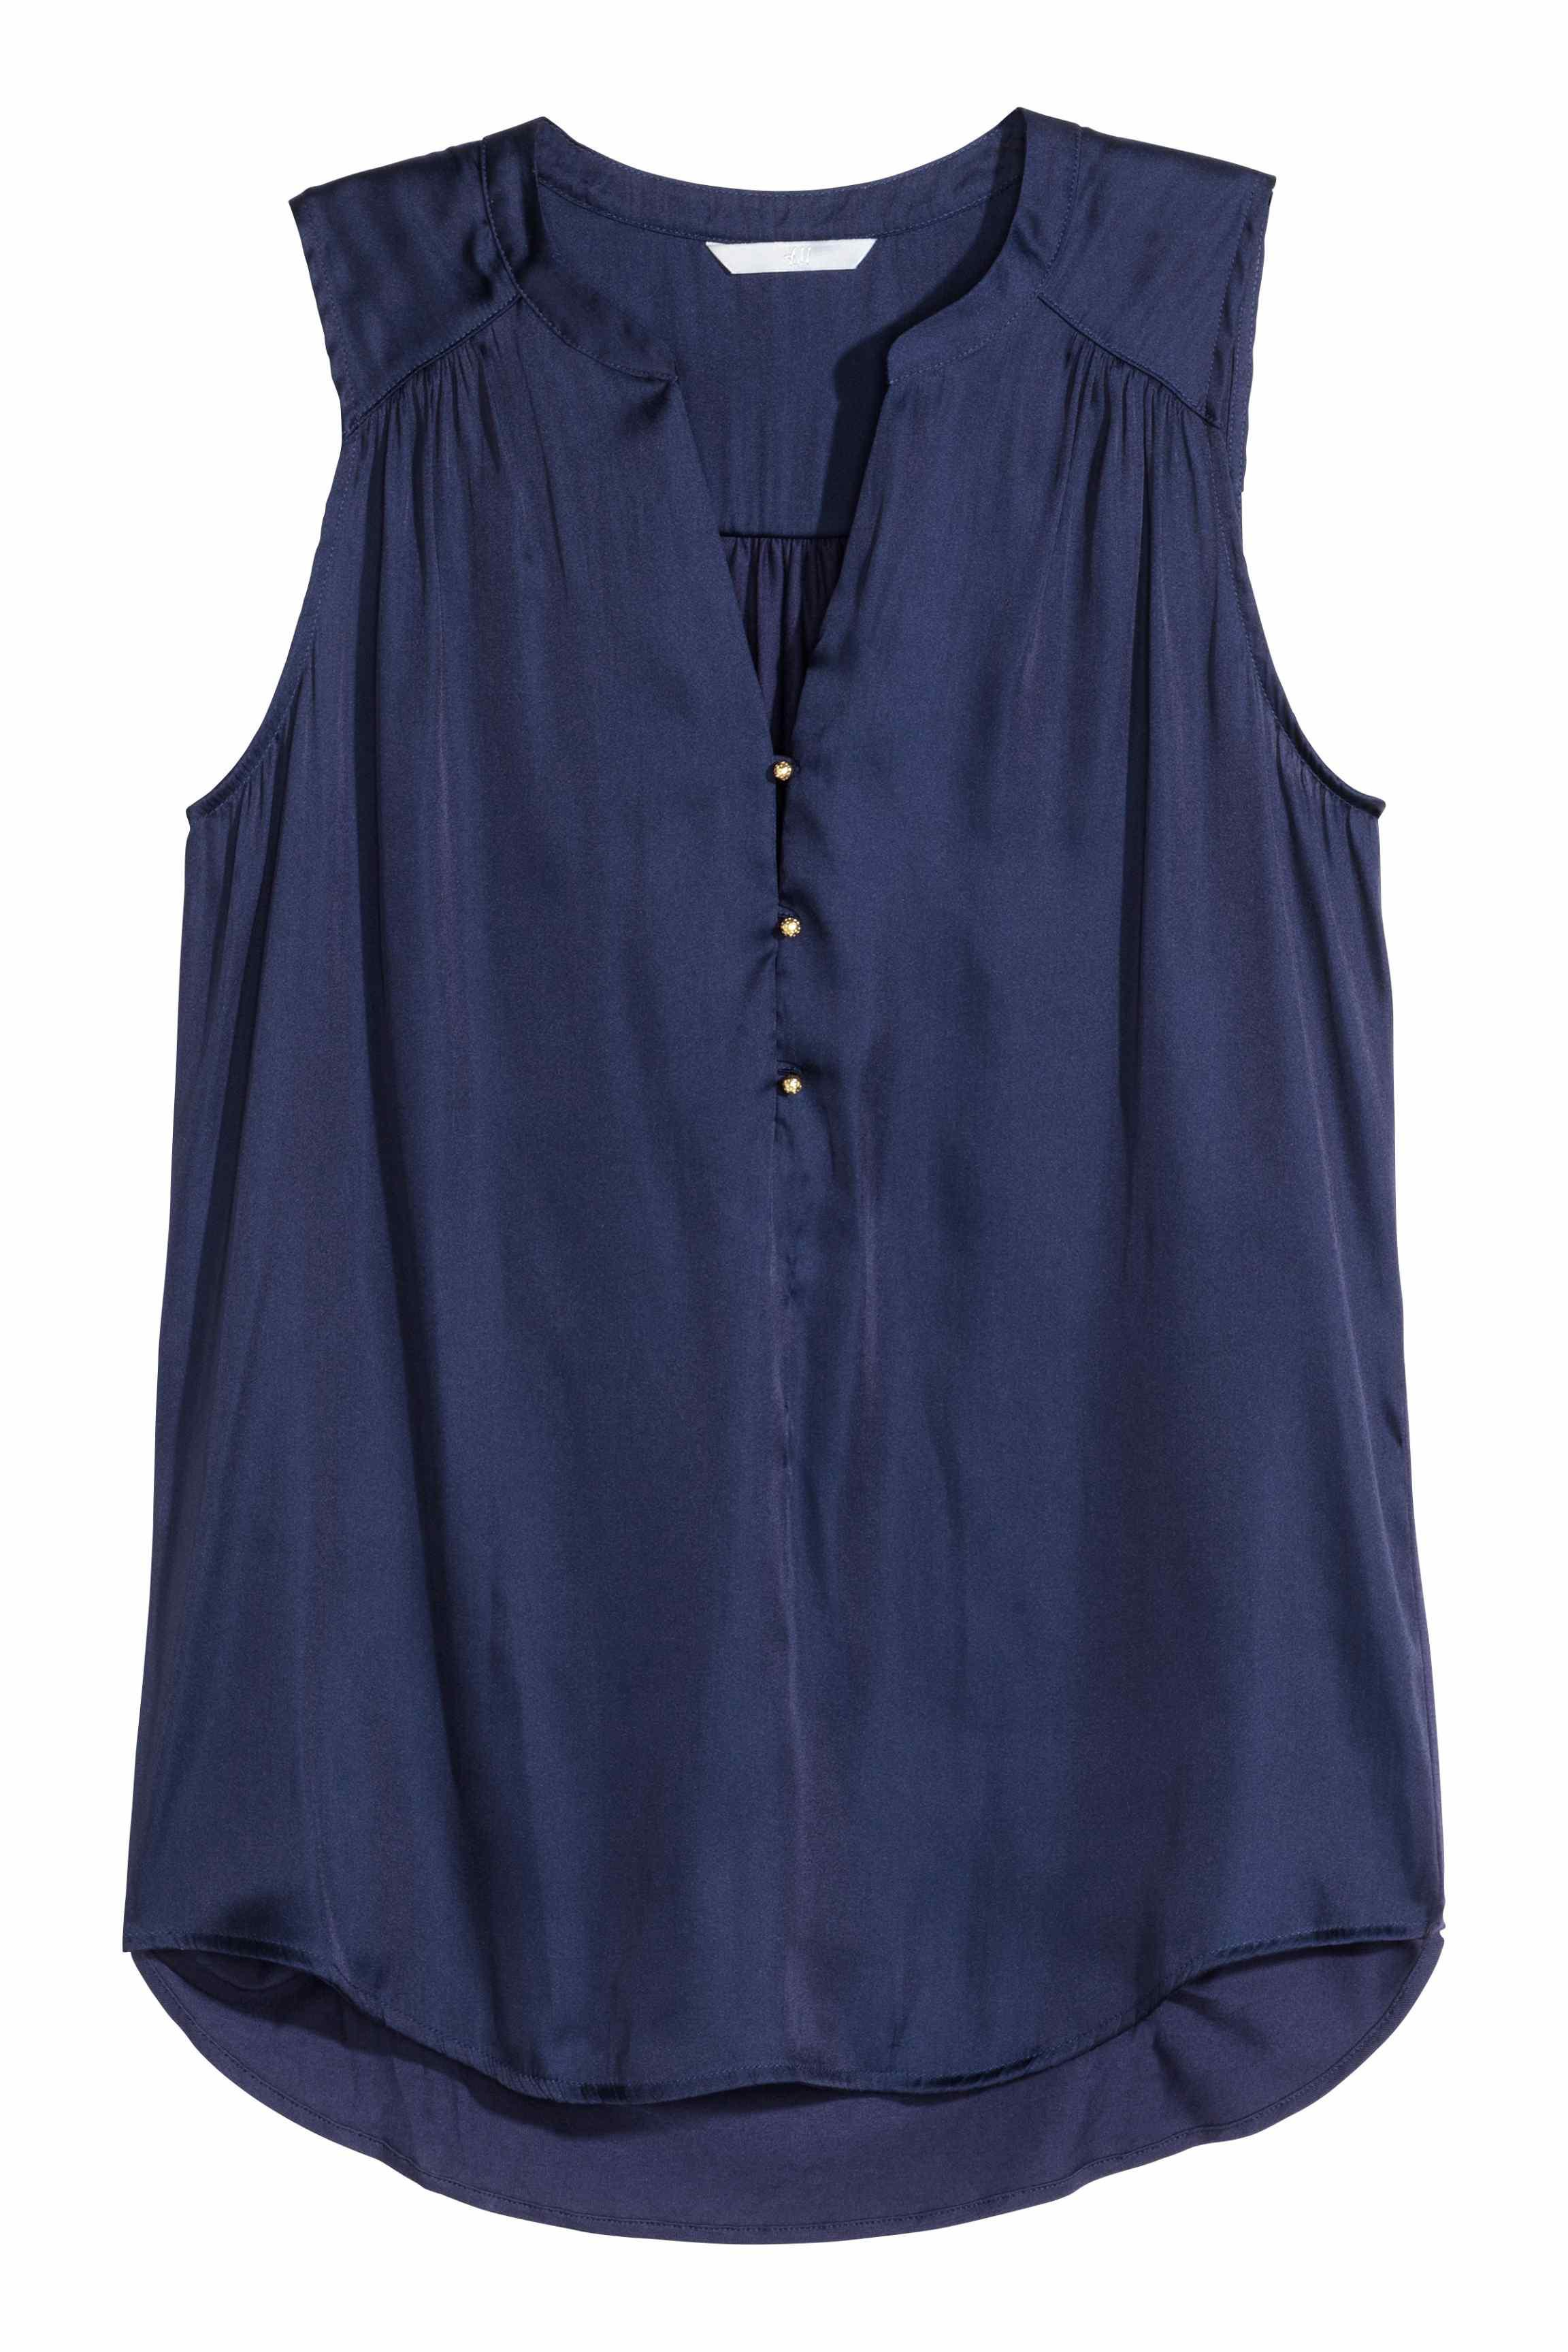 h m blouse sale blue denim blouses. Black Bedroom Furniture Sets. Home Design Ideas